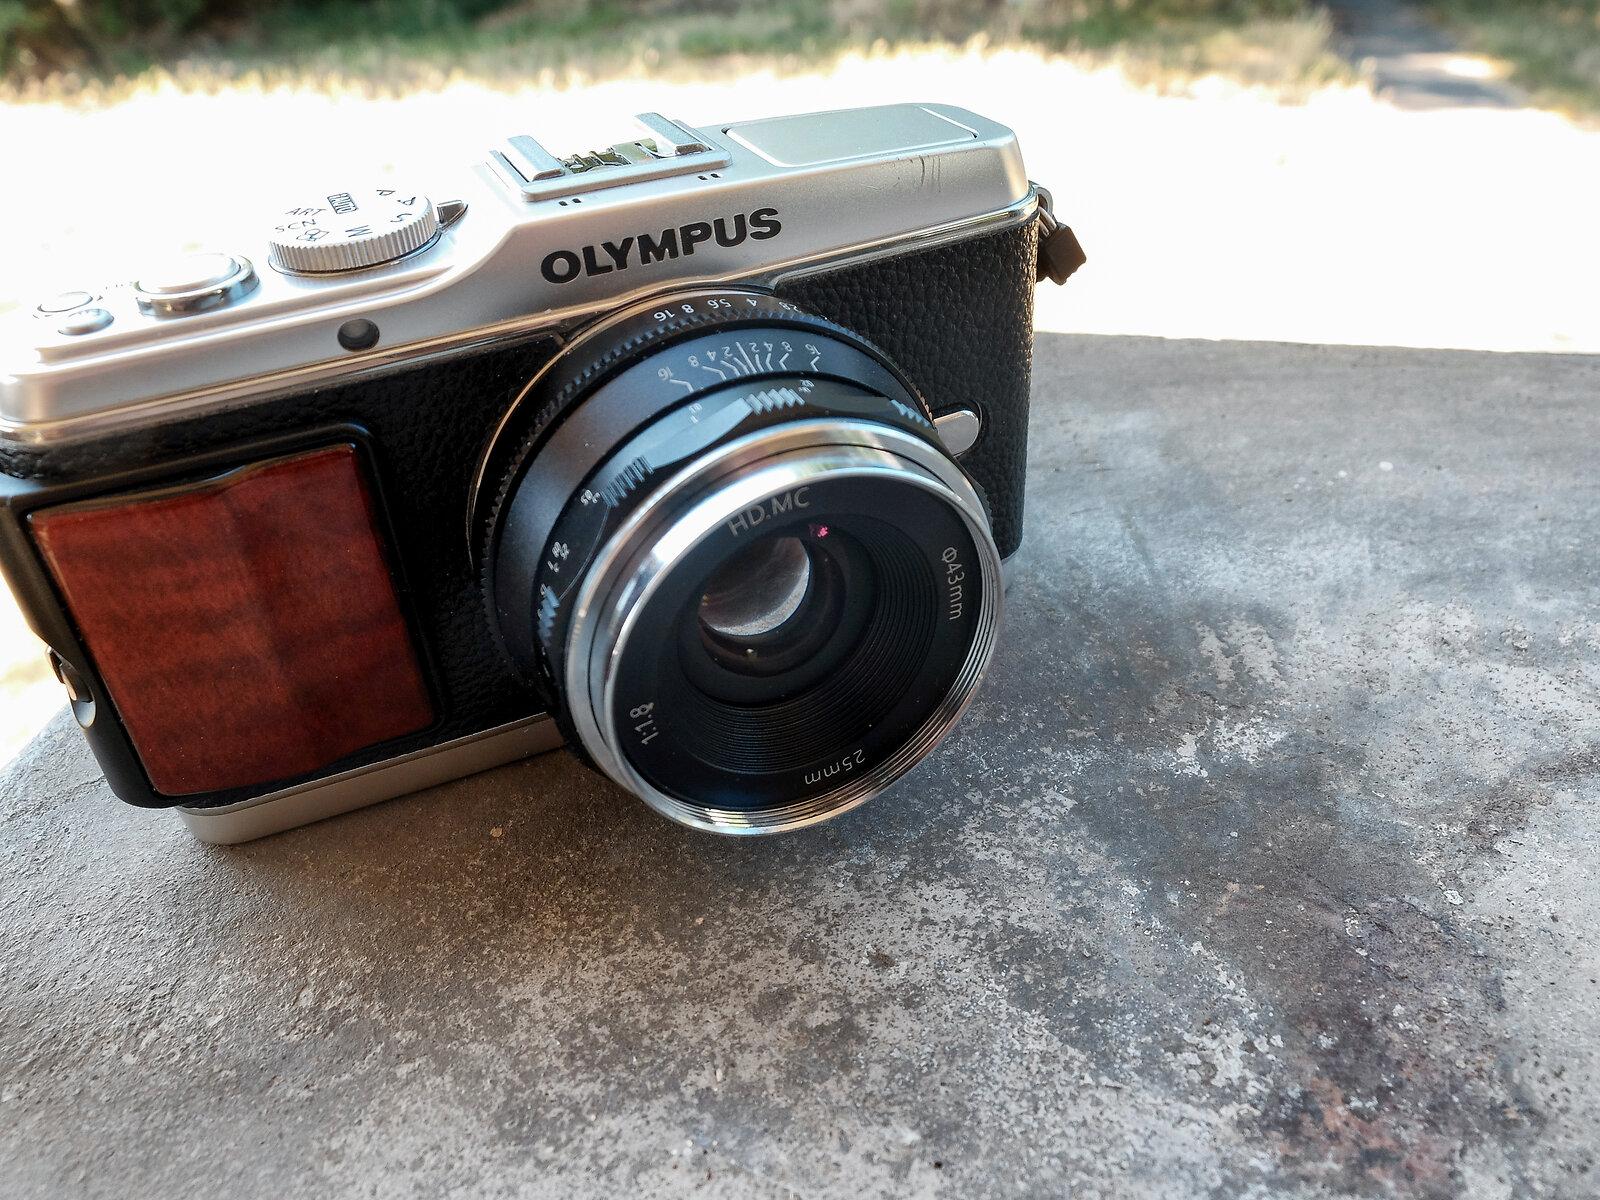 X30_July21_Pergear_lens_OnCamera.jpg